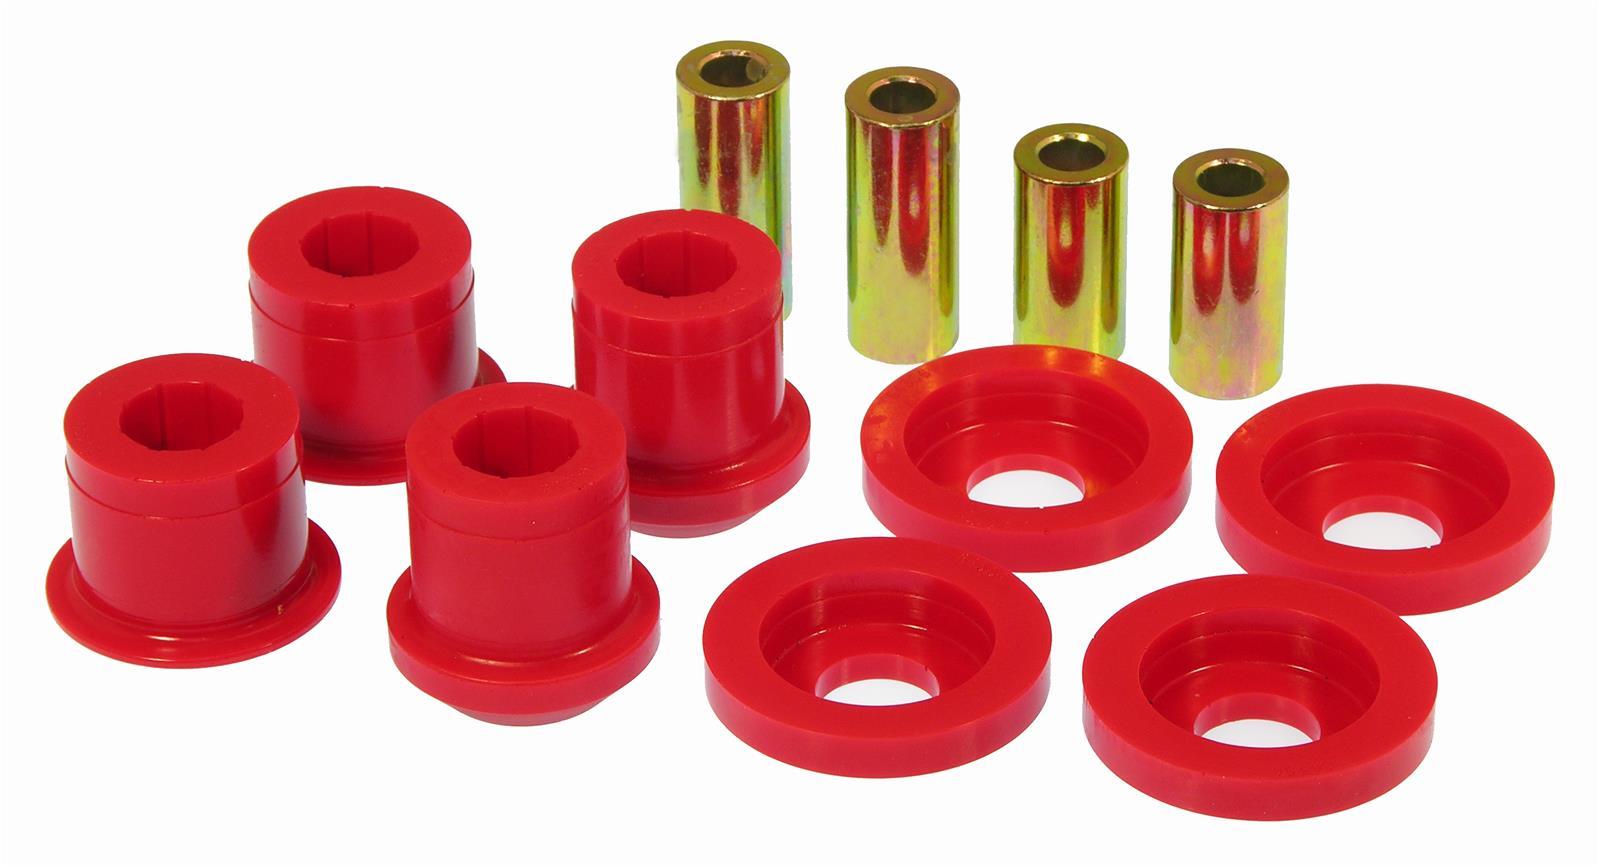 Prothane 6-313 Red Rear Lower Control Arm Bushing Kit